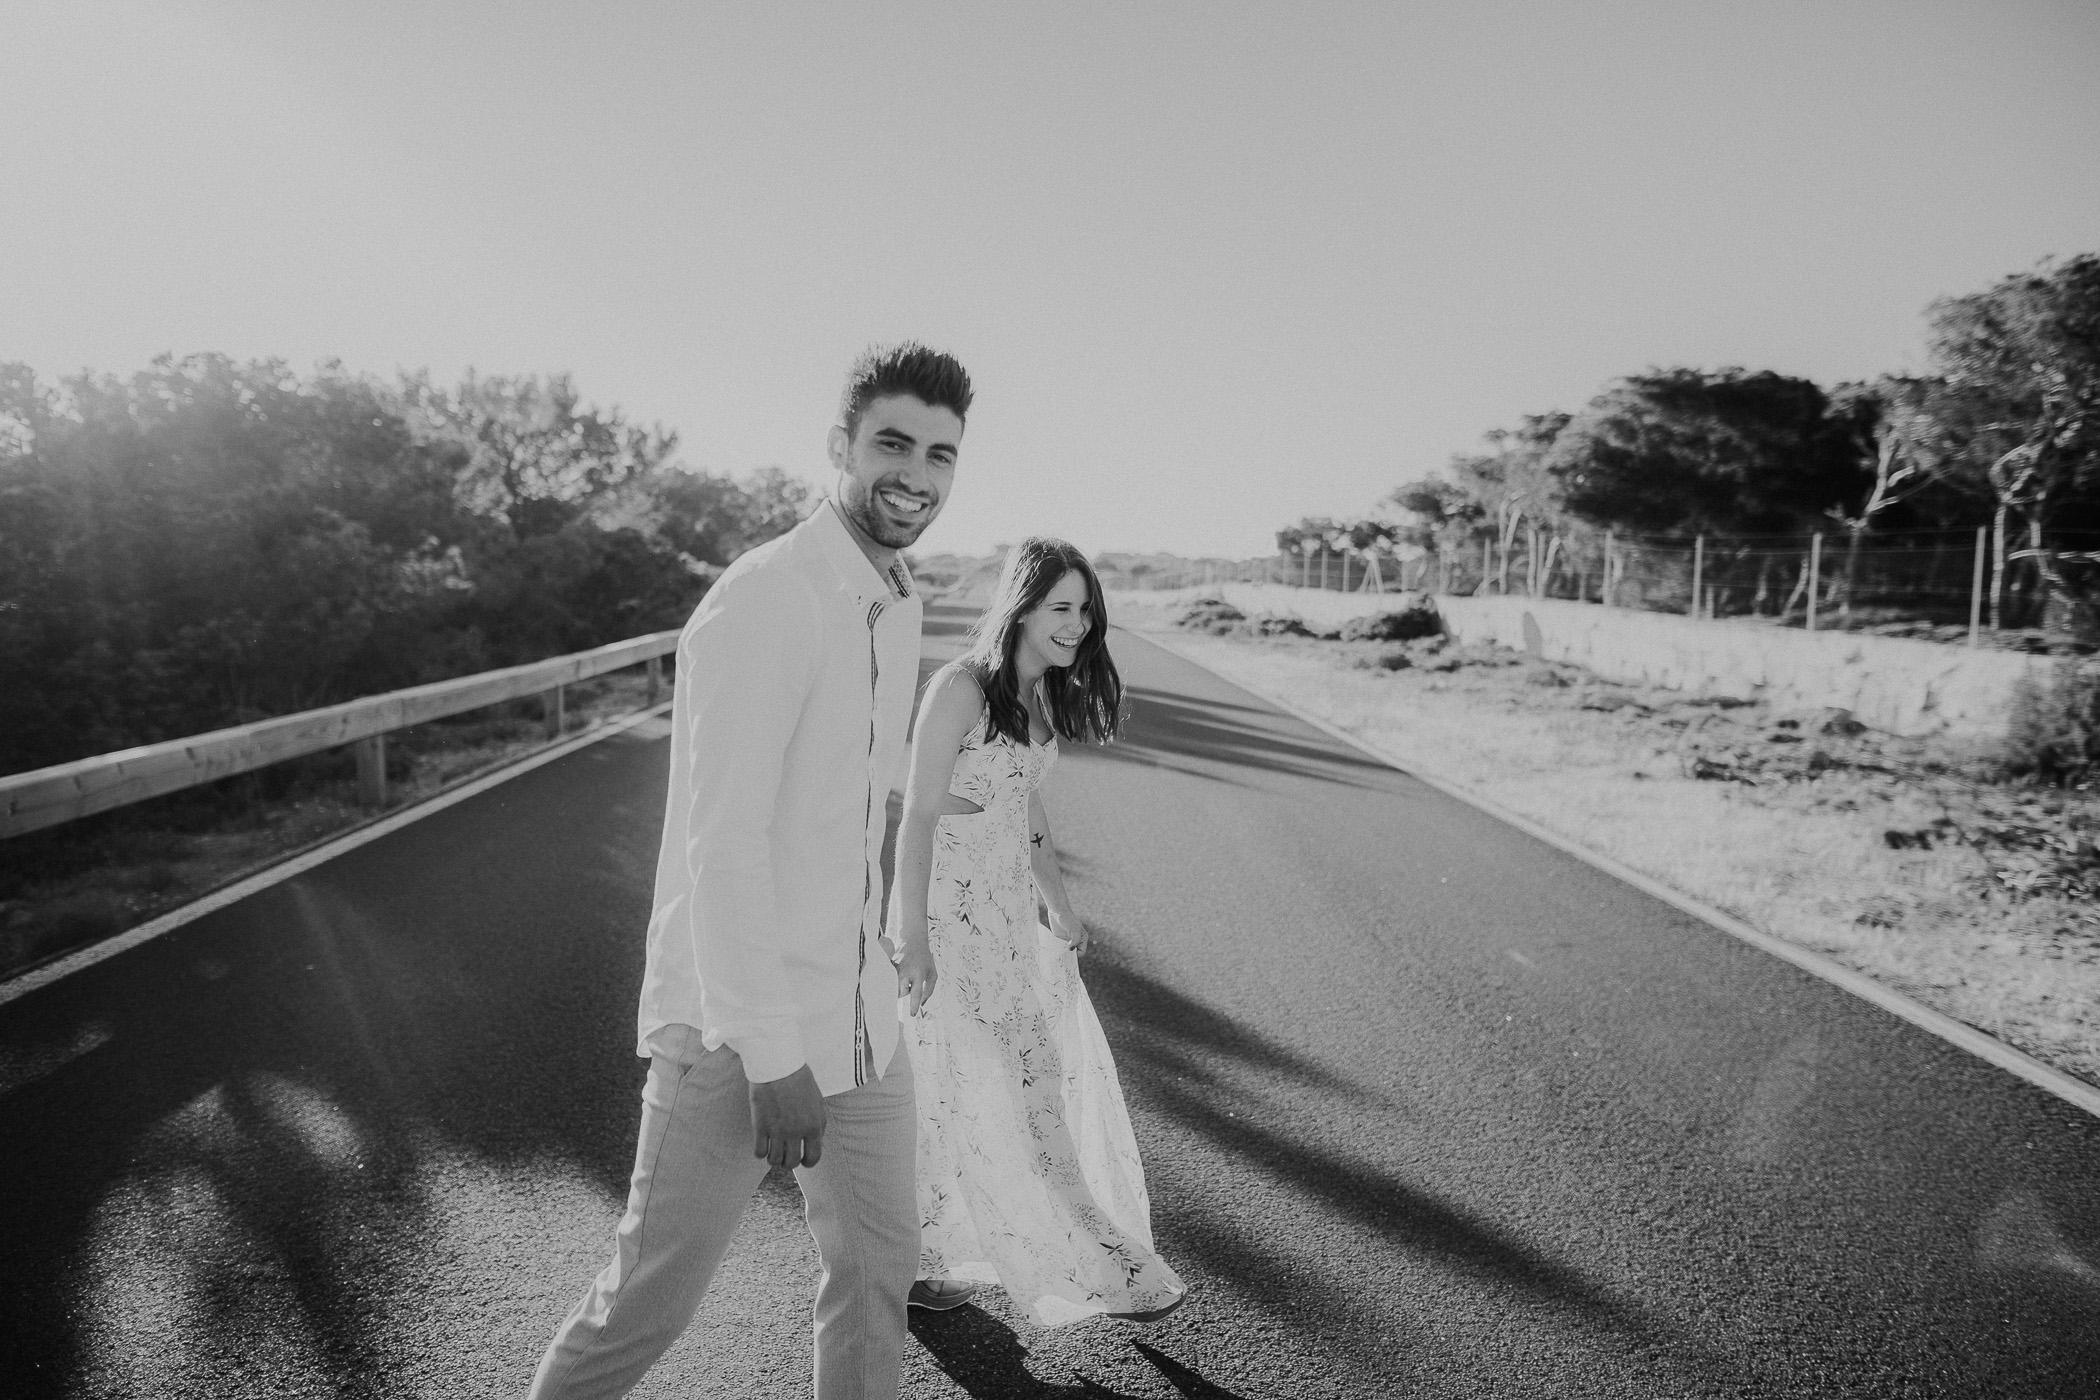 DanielaMarquardtPhotography_wedding_elopement_mallorca_spain_calapi_palma_lauraandtoni_411